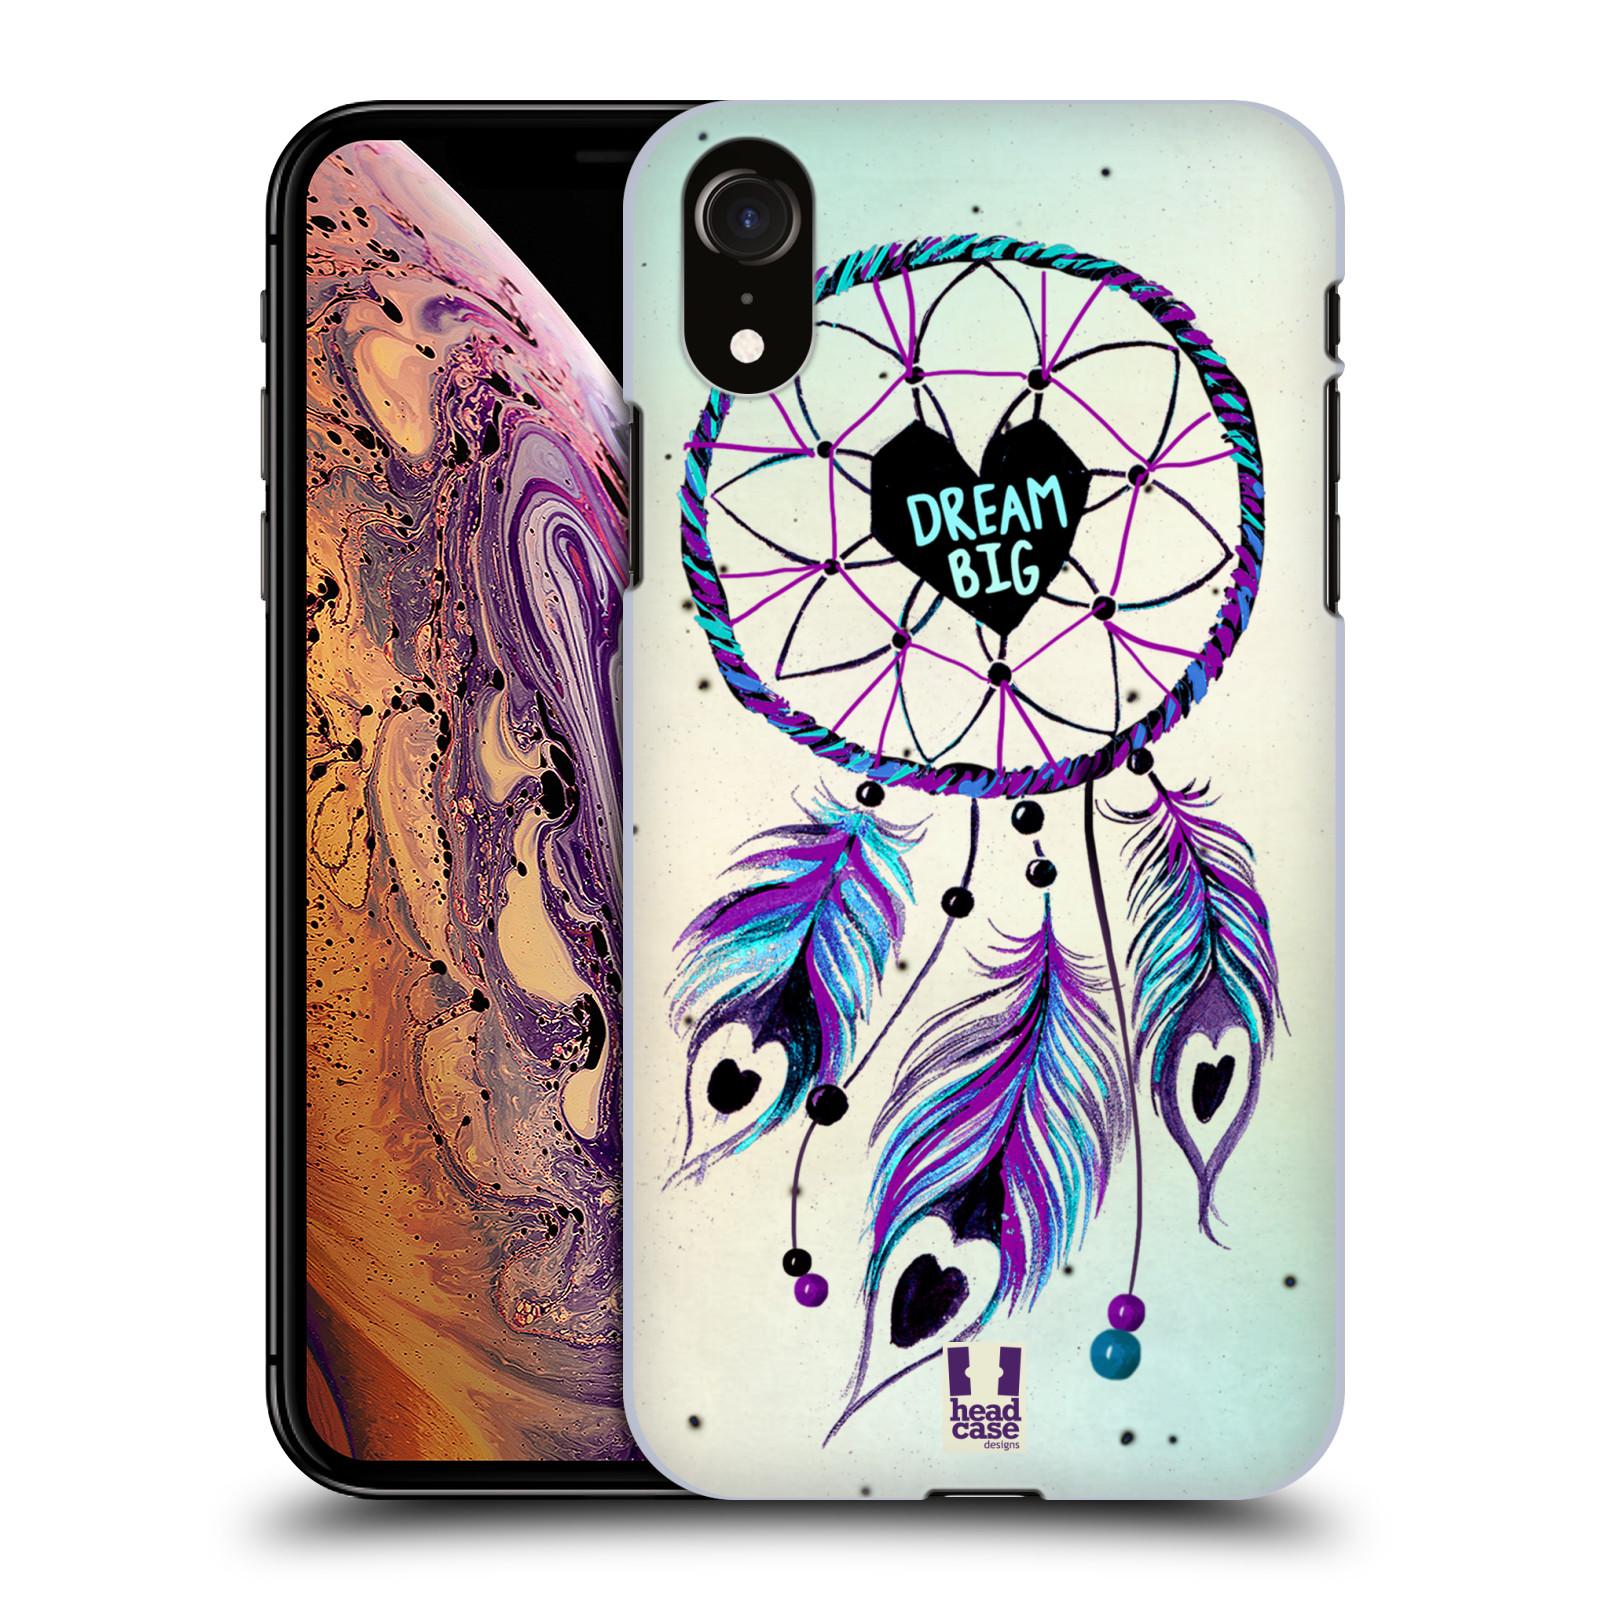 Plastové pouzdro na mobil Apple iPhone XR - Head Case - Lapač Assorted Dream Big Srdce